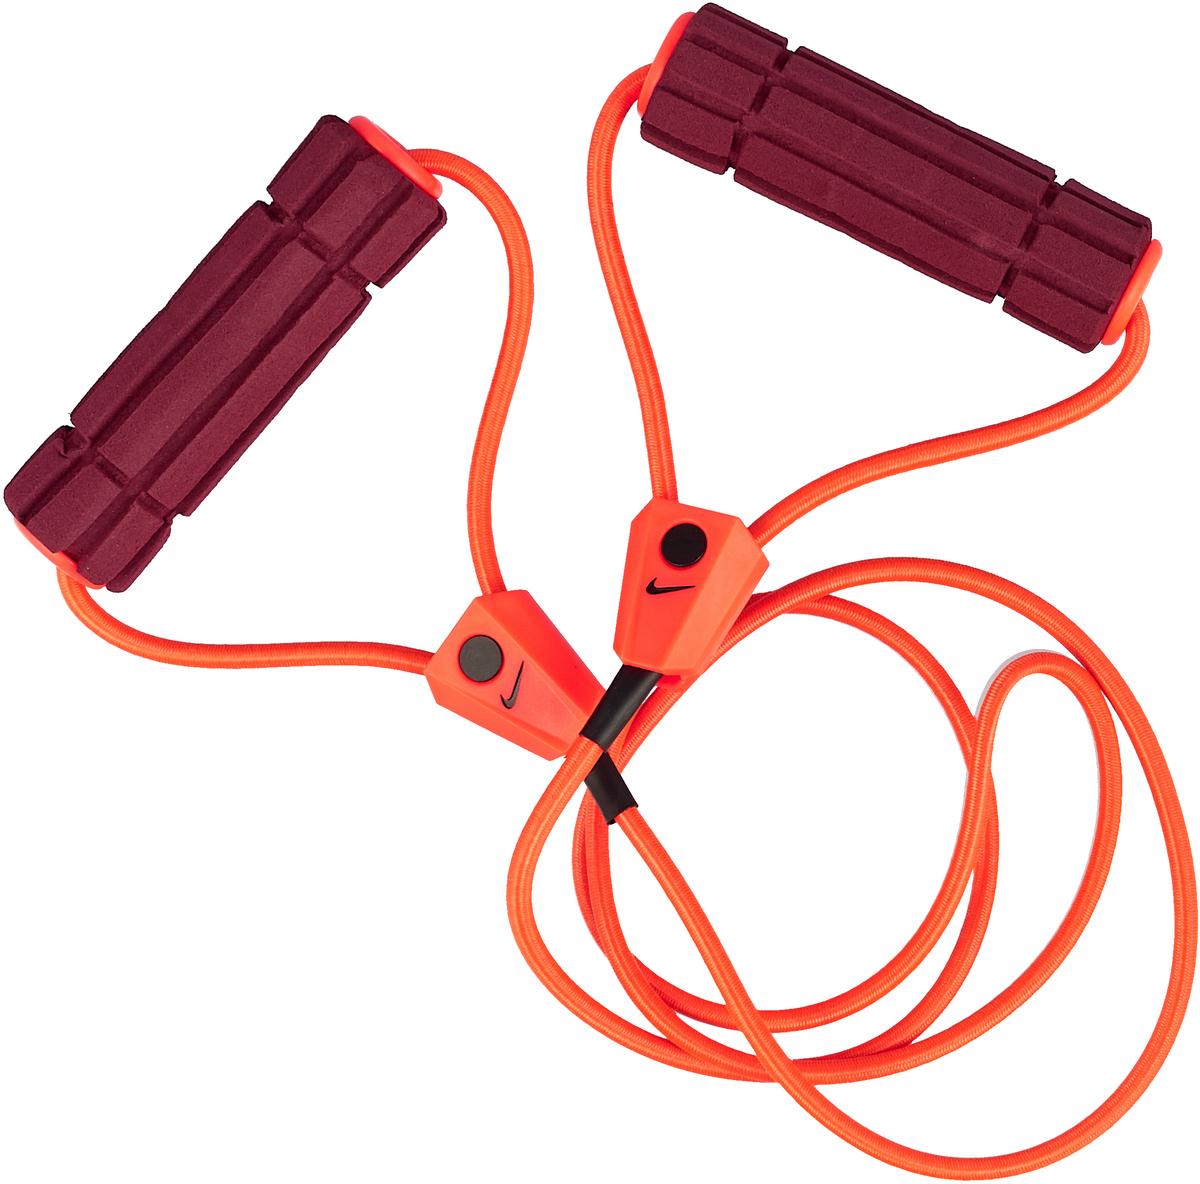 Эспандер Nike, цвет: красный, бордовый, черный. N.ER.12.691.NS